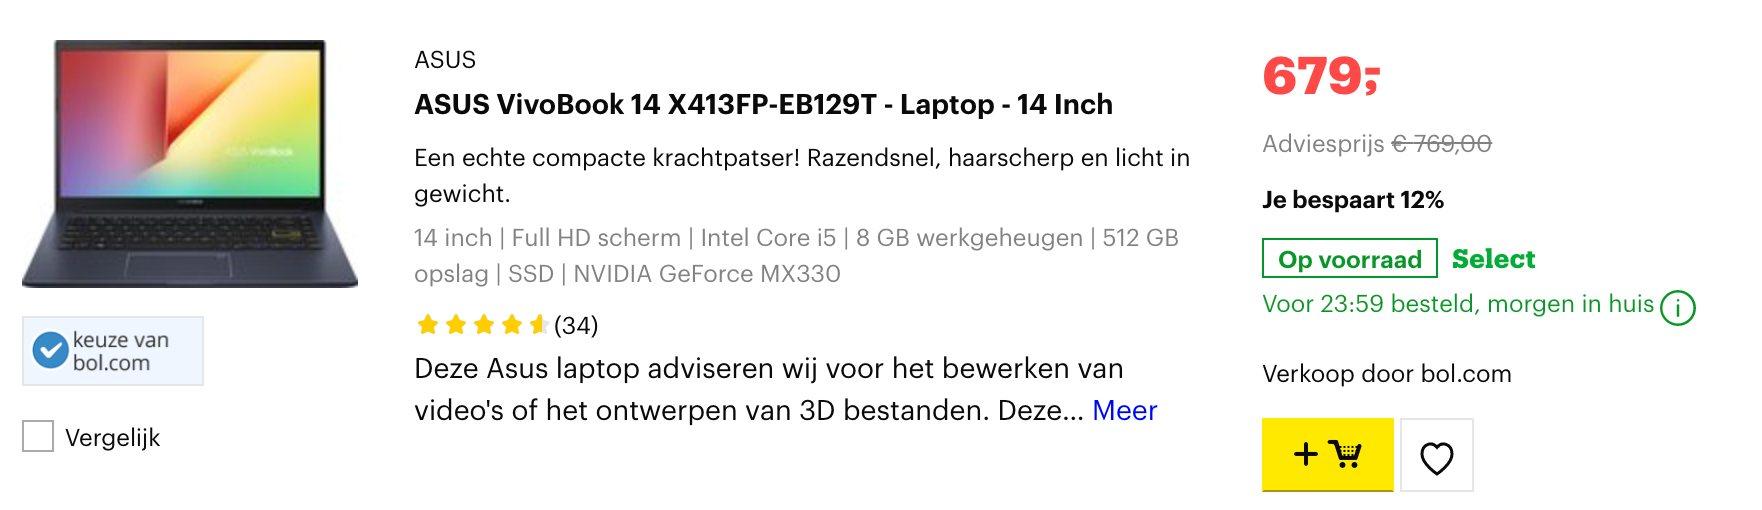 ASUS VivoBook 14 X413FP-EB129T